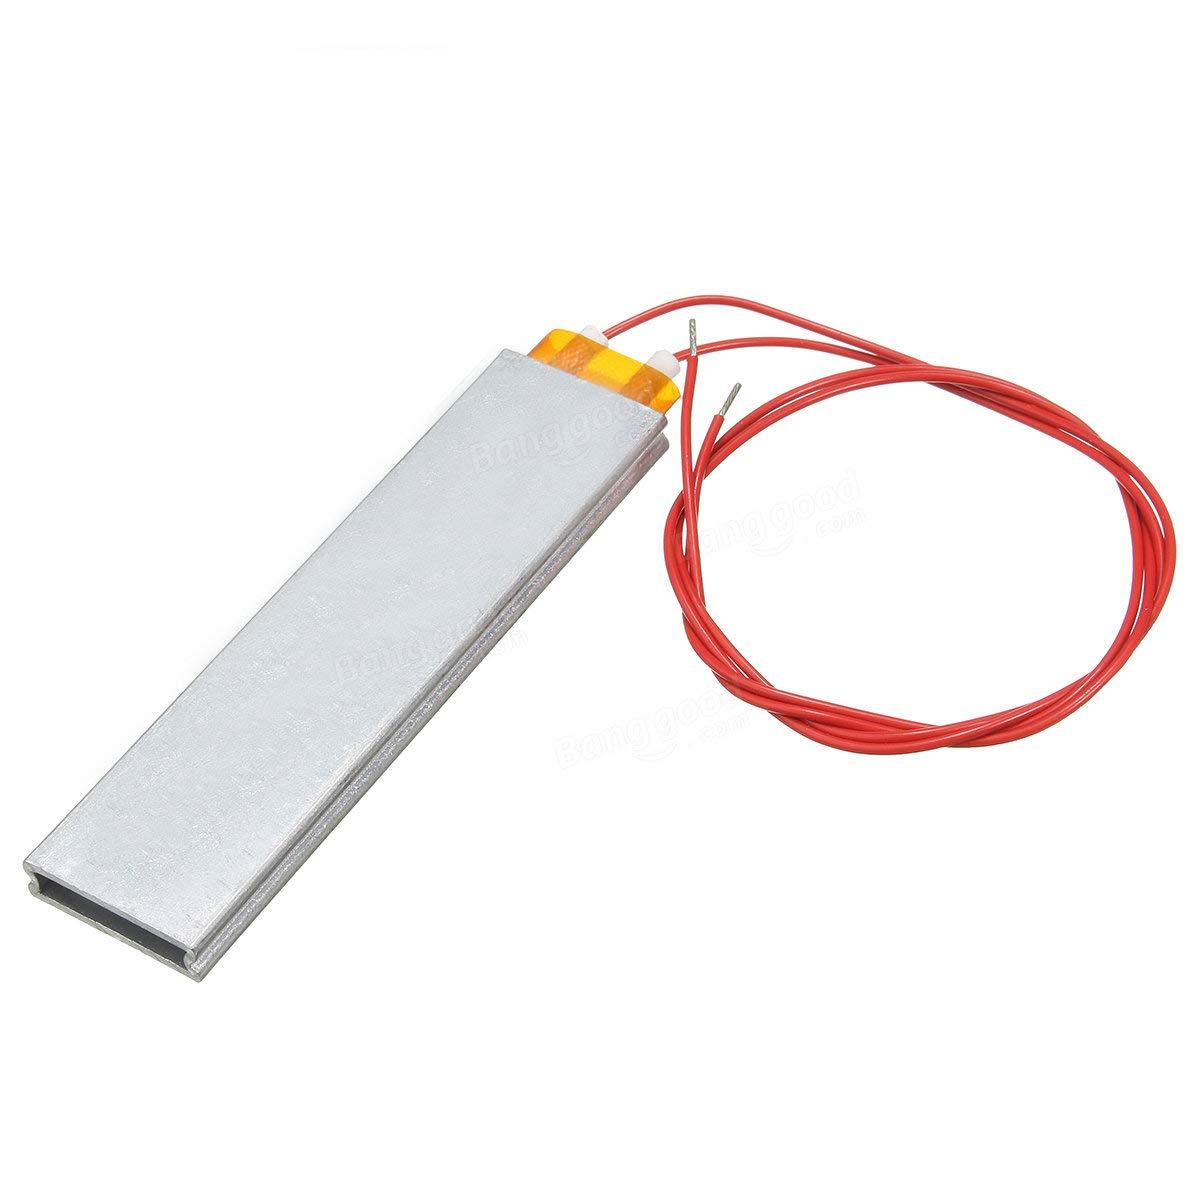 110V 80W Incubator Heating Element Replacement Part For 48//56 Egg Incubator Arduino Compatible SCM /& DIY Kits Smart Robot /& Solar Panel 1x Incubator Heating Element